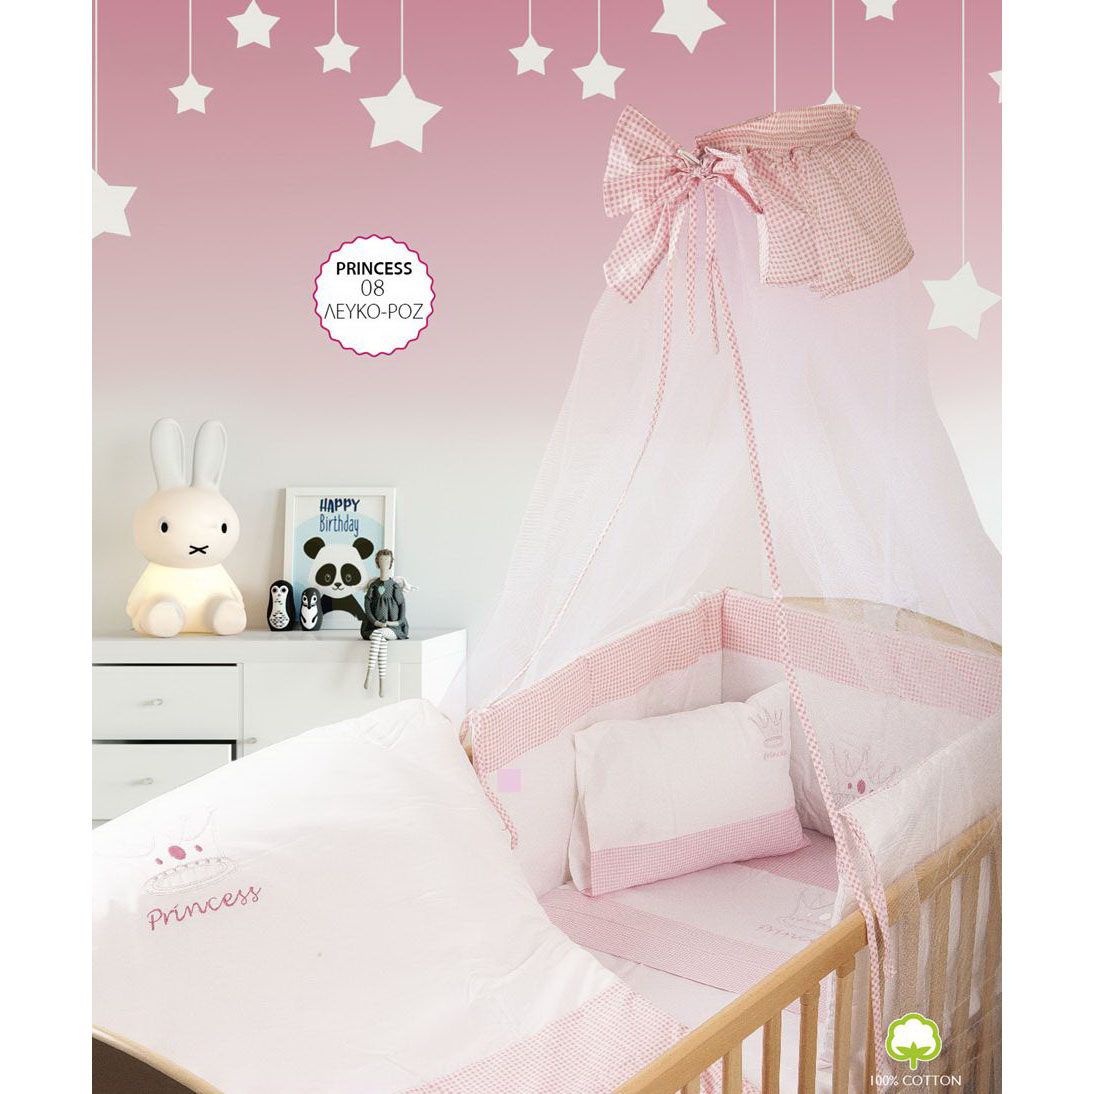 dd0bbf6c73c Προίκα Μωρού (Dim-Princess) | Lux House | Λευκά Είδη | Διακοσμητικά |  Ριχτάρια | Παιδικά και Βρεφικά | Αξεσουάρ Μπάνιου | Χαλιά | Προσφορές για  Υπνοδωμάτιο, ...